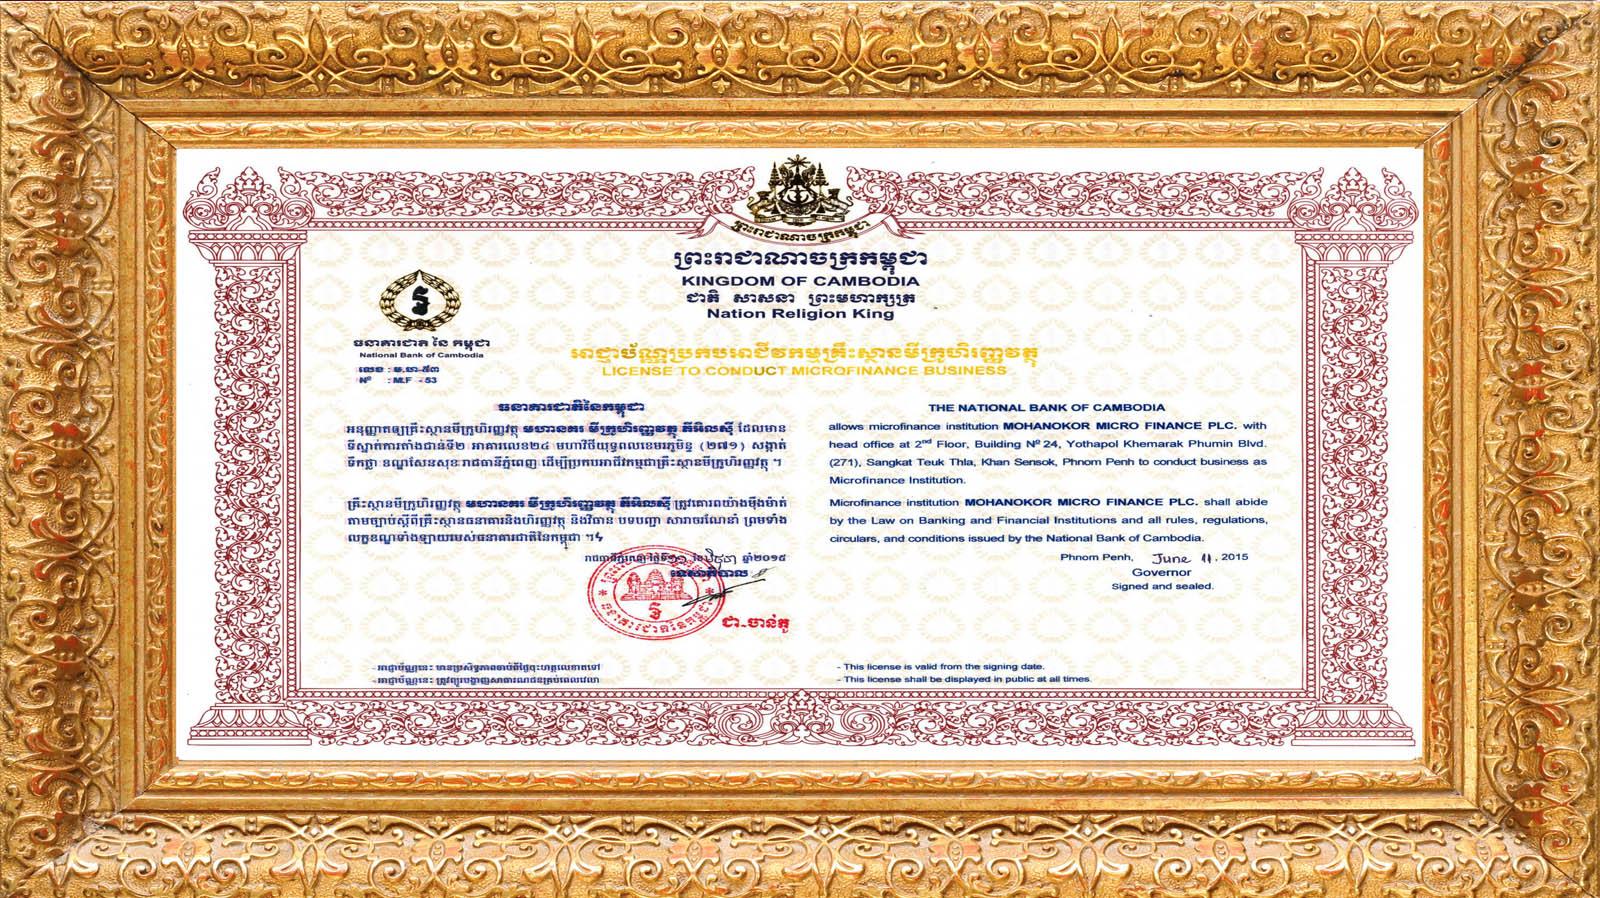 MOHANOKOR Microfinance Institution Plc